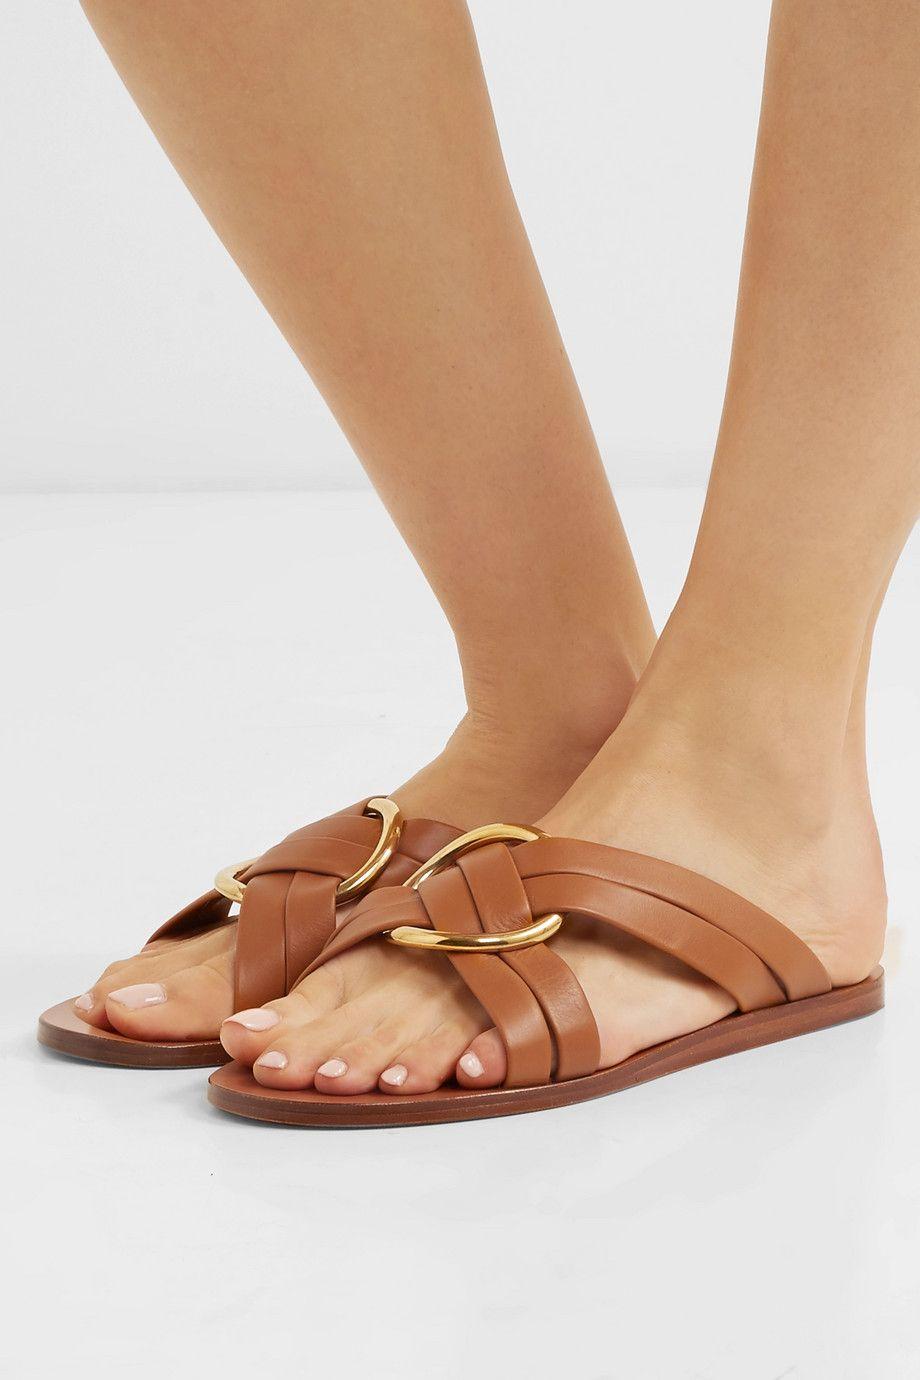 Chloé Rony flat sandals SnEw44o5